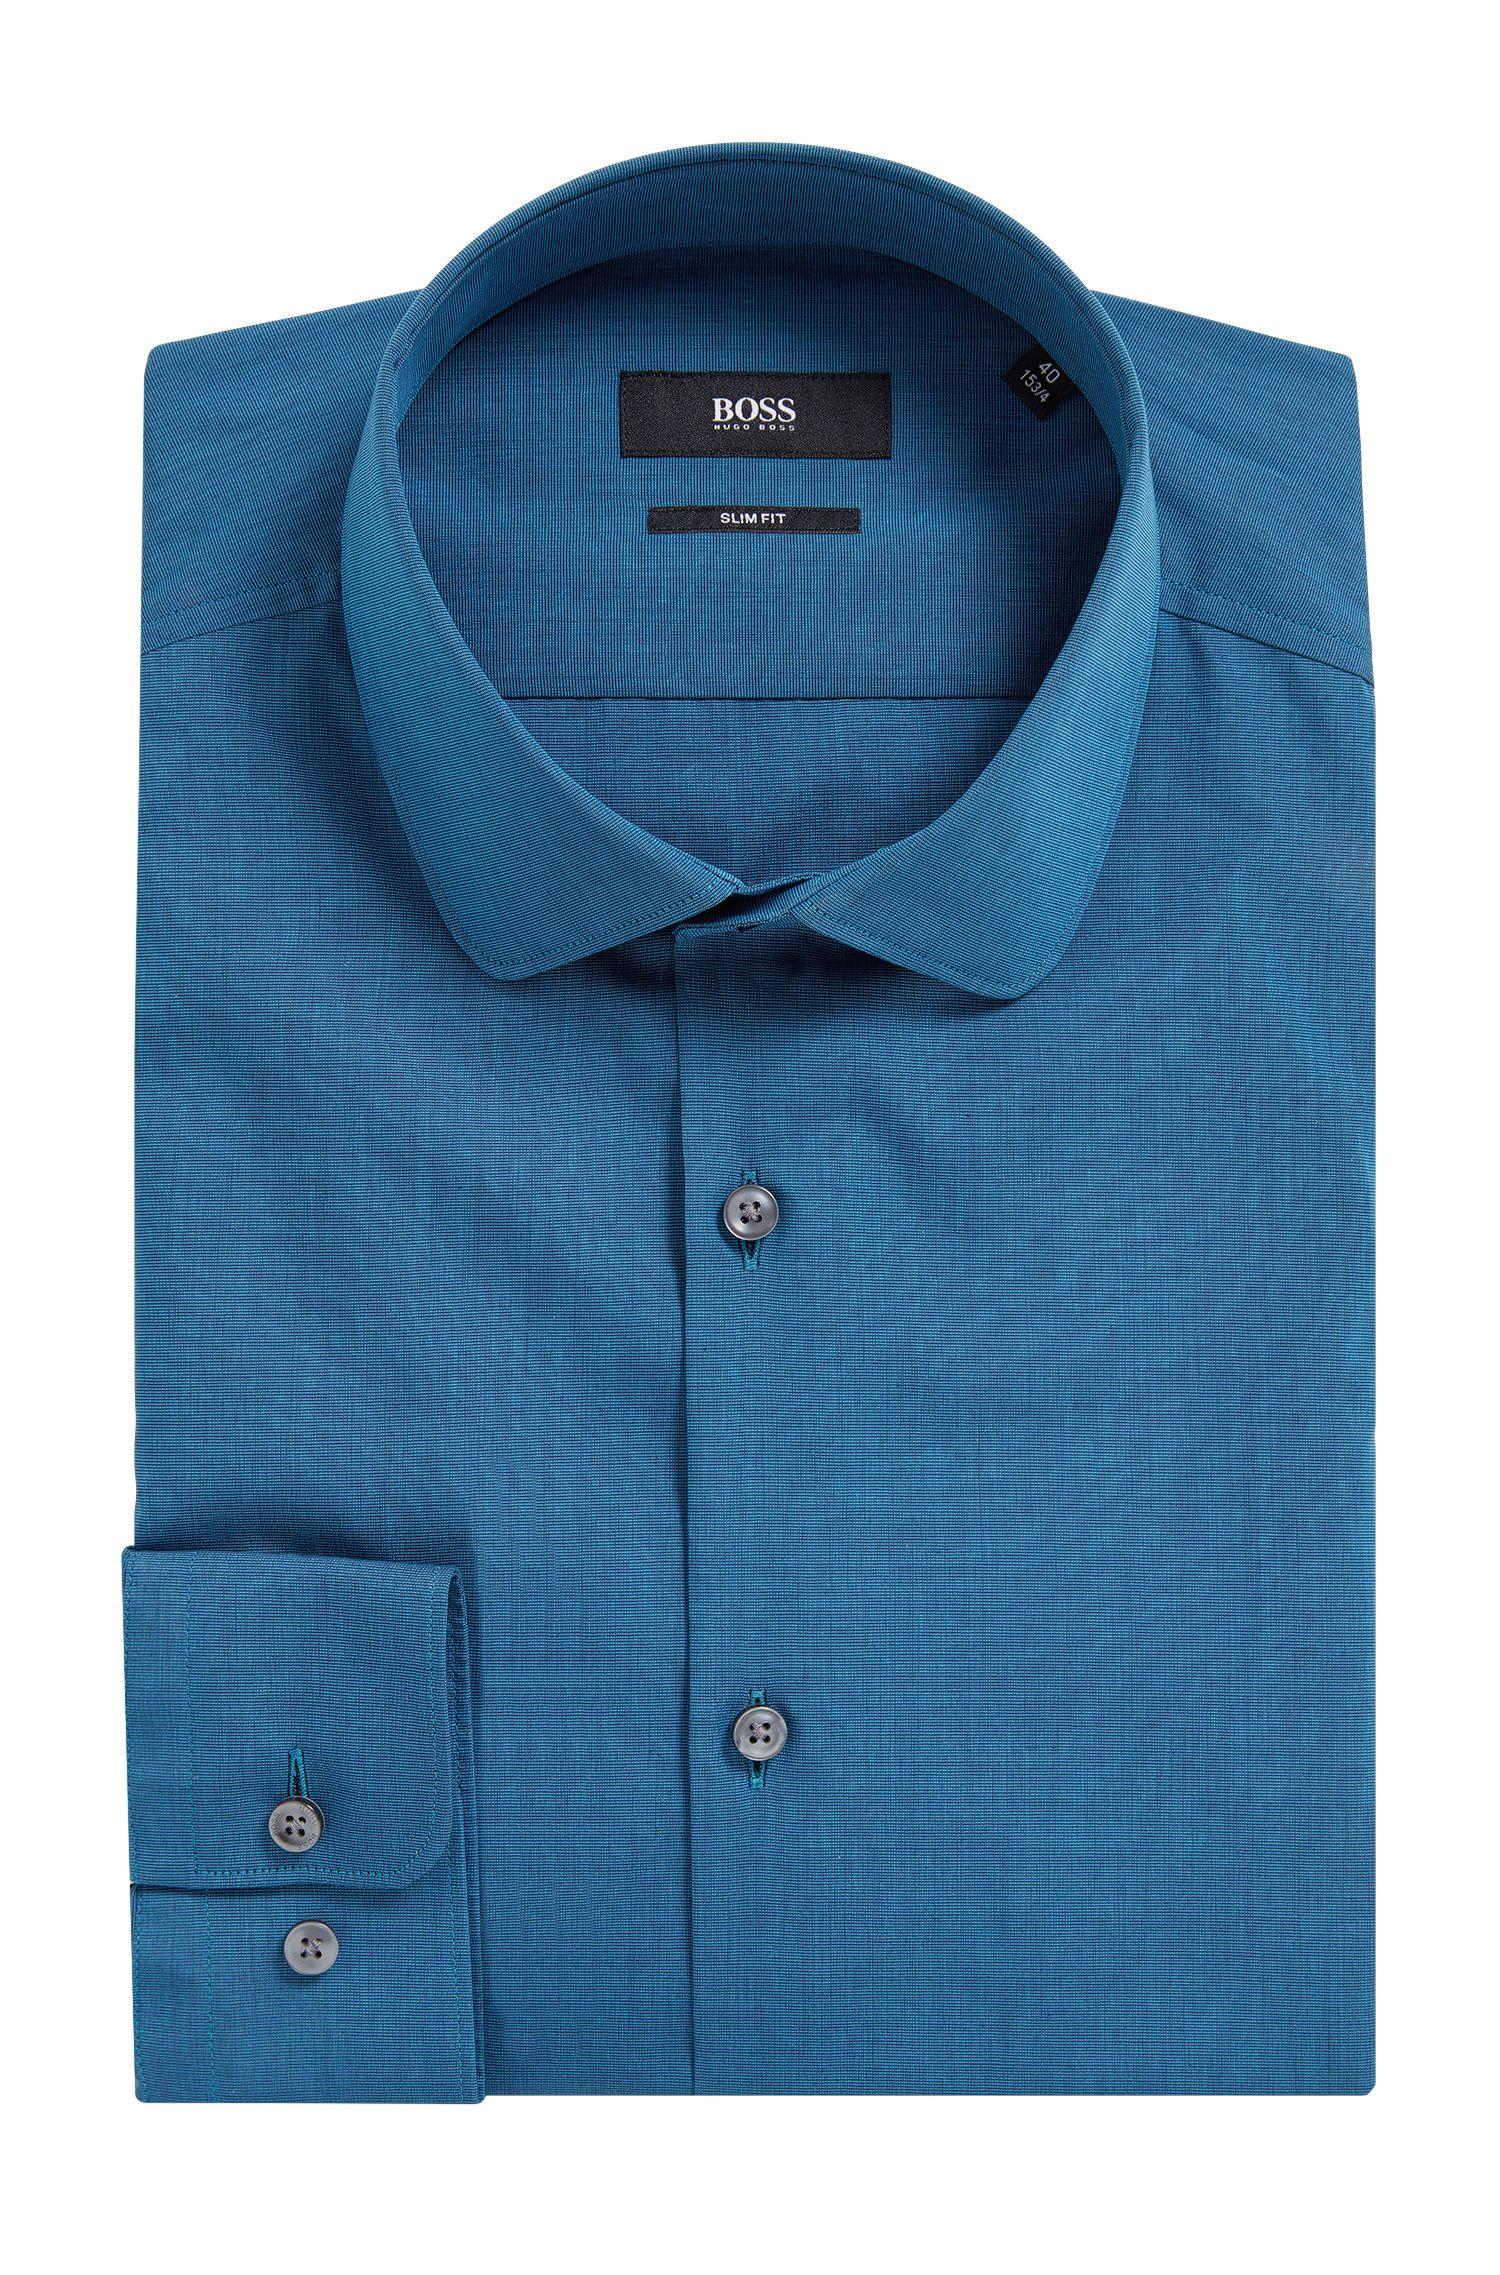 Cotton Poplin Dress Shirt, Slim Fit | Joshua